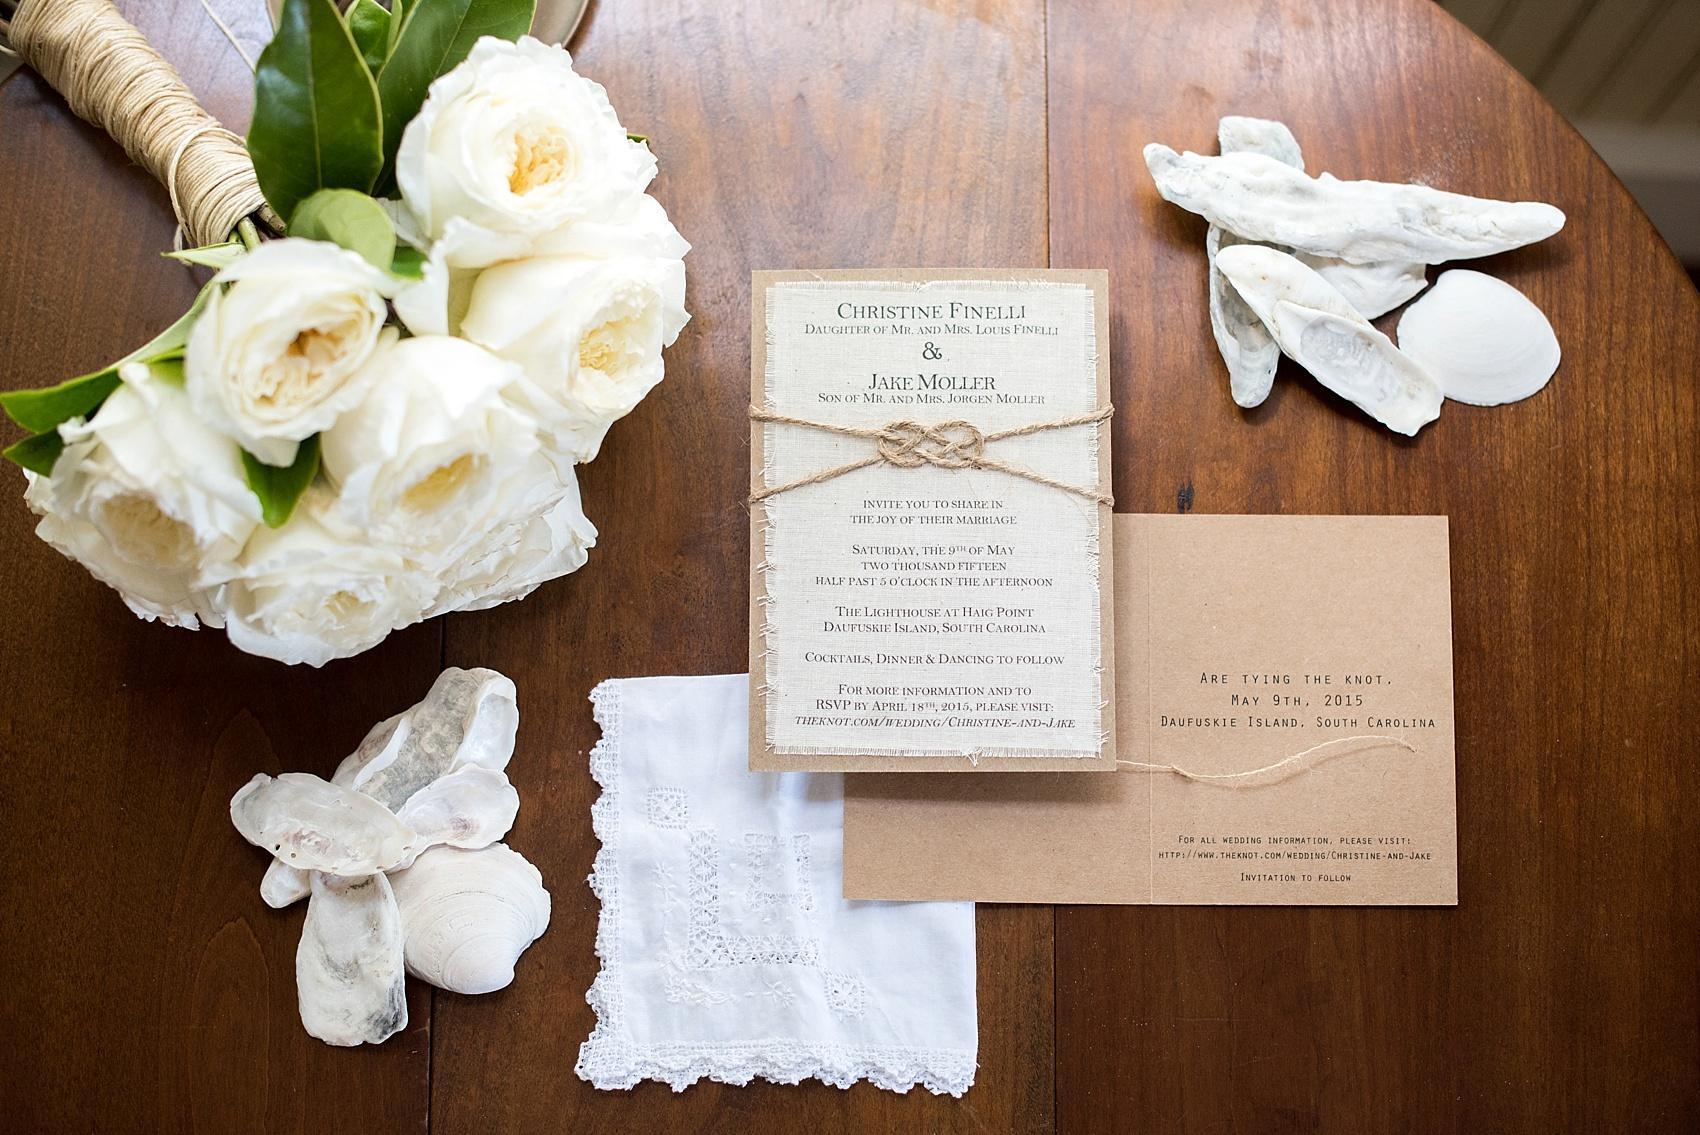 Southern beach wedding invitation. Photos by Mikkel Paige for a Hilton Head, Haig Point wedding.